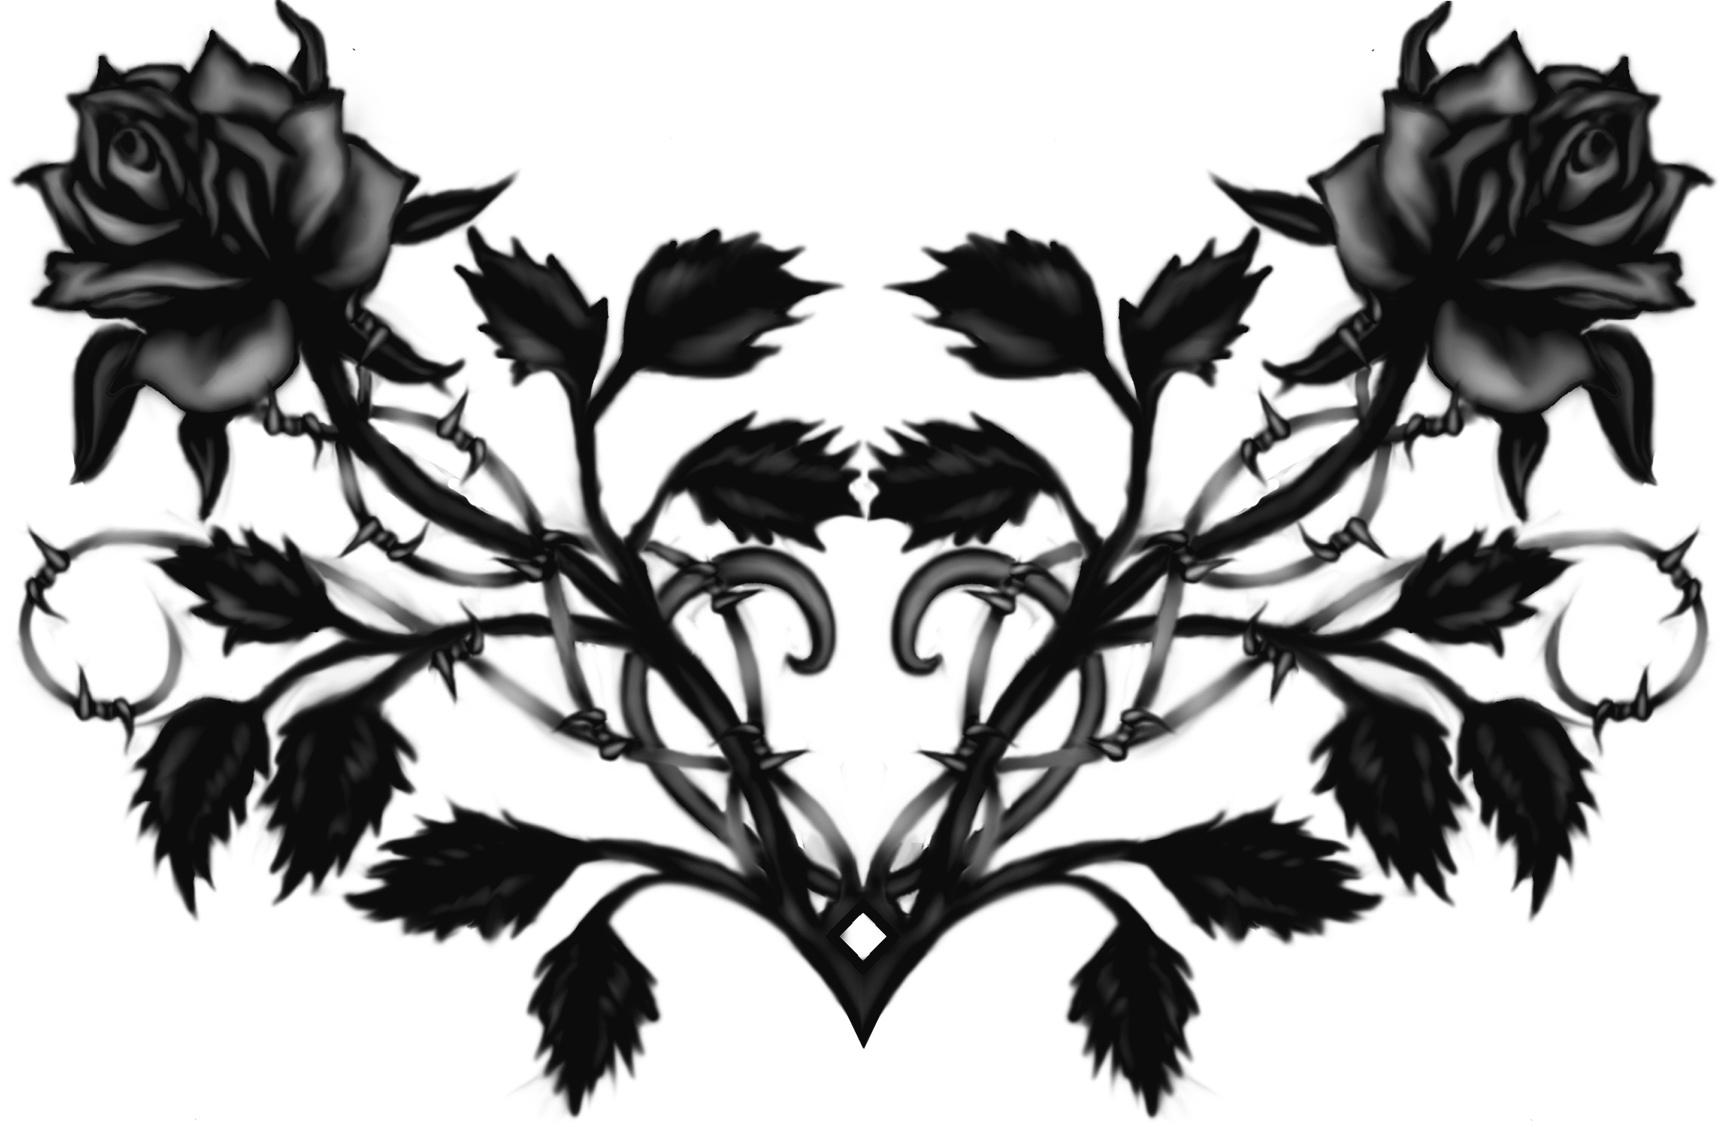 Hottoe Black Rose Tattoo Designs Tattoos Tattoos Design Flower